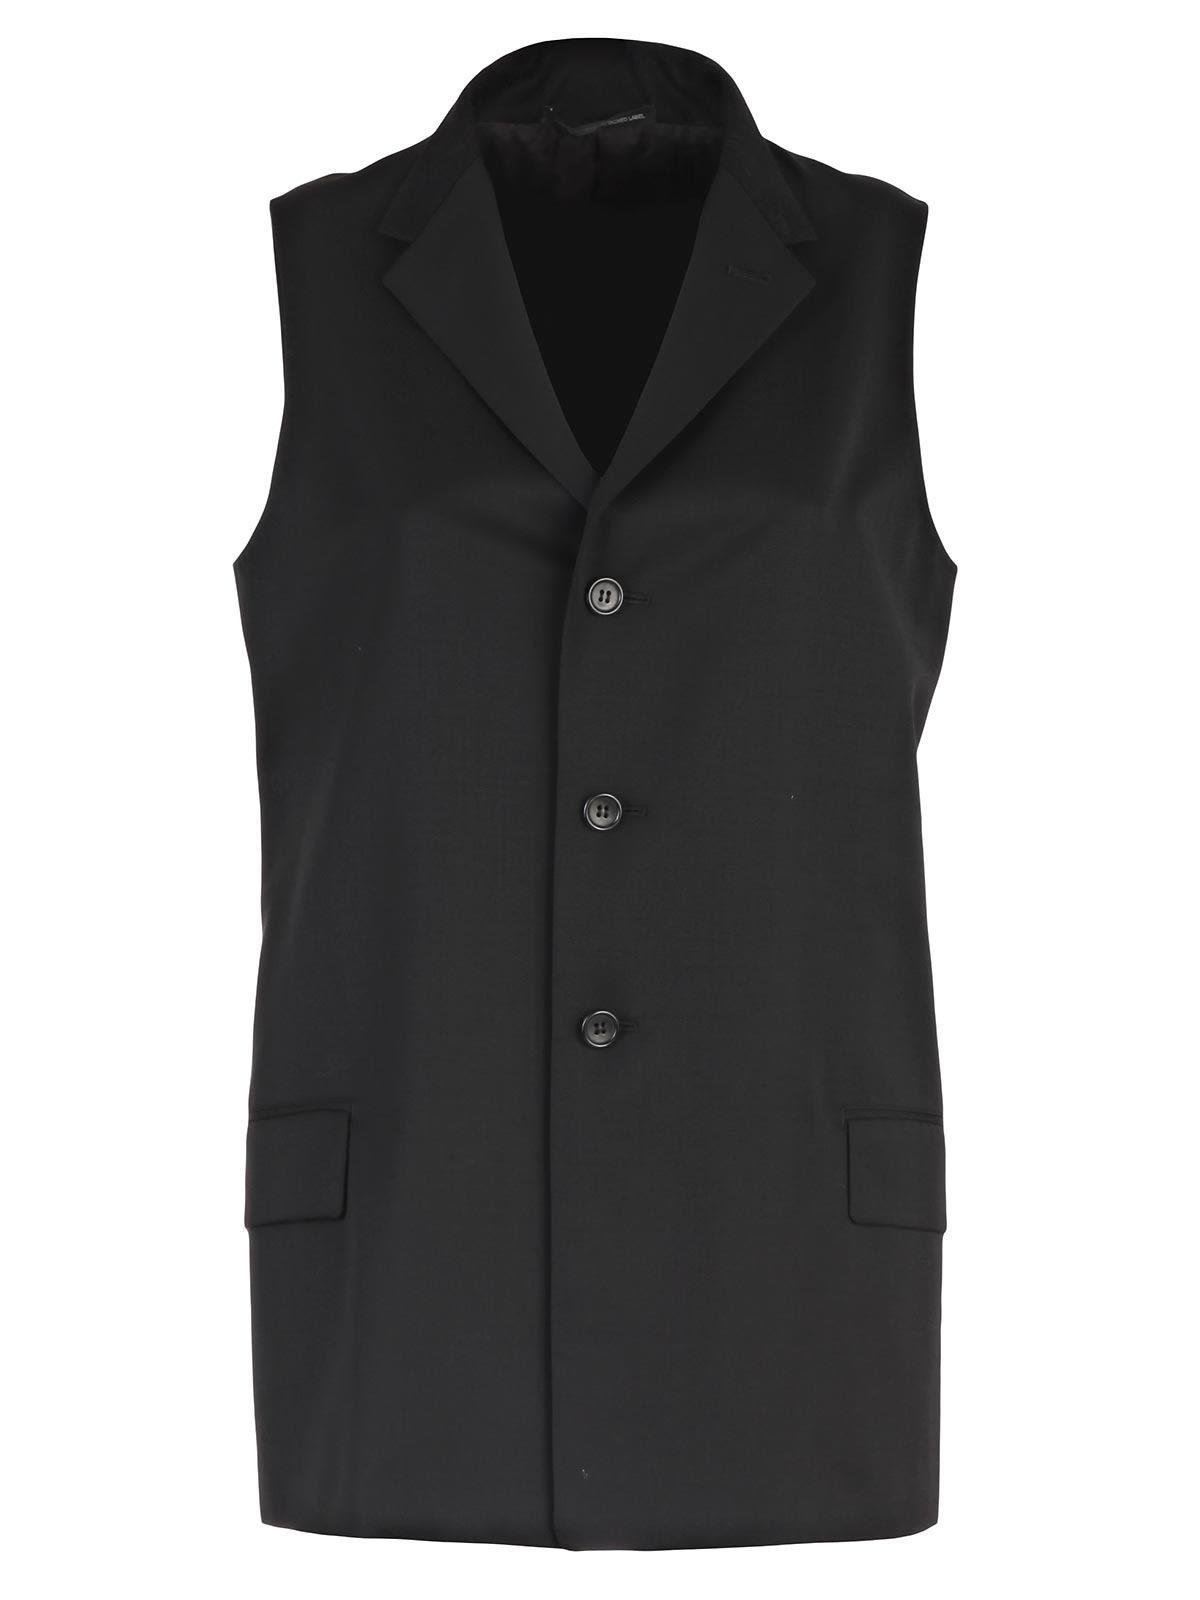 Saint Laurent Vest In Black